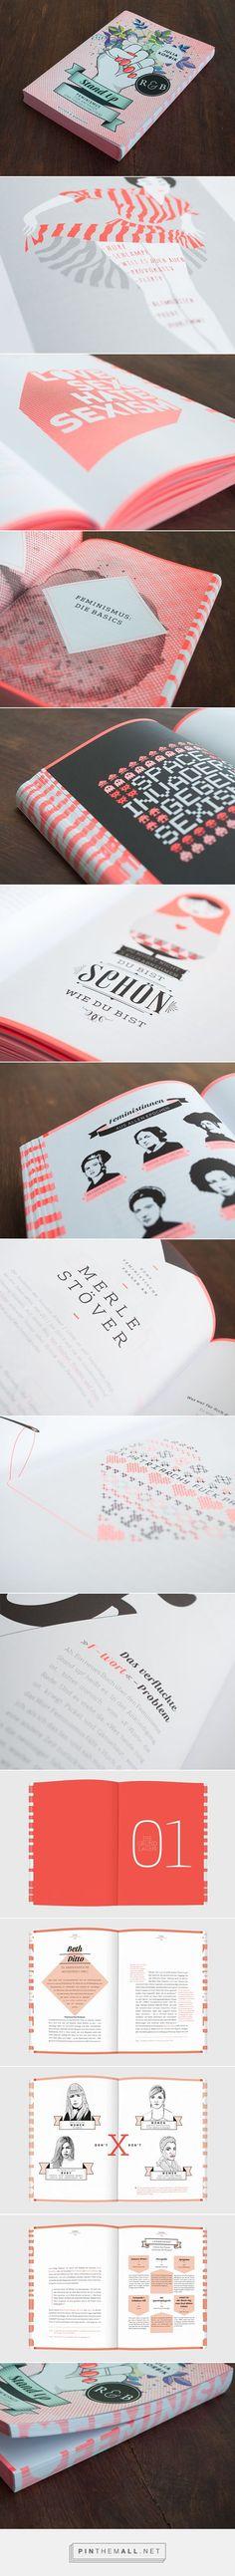 Stand Up by Studio Grau, a handbook on feminism. Fantastic editorial design